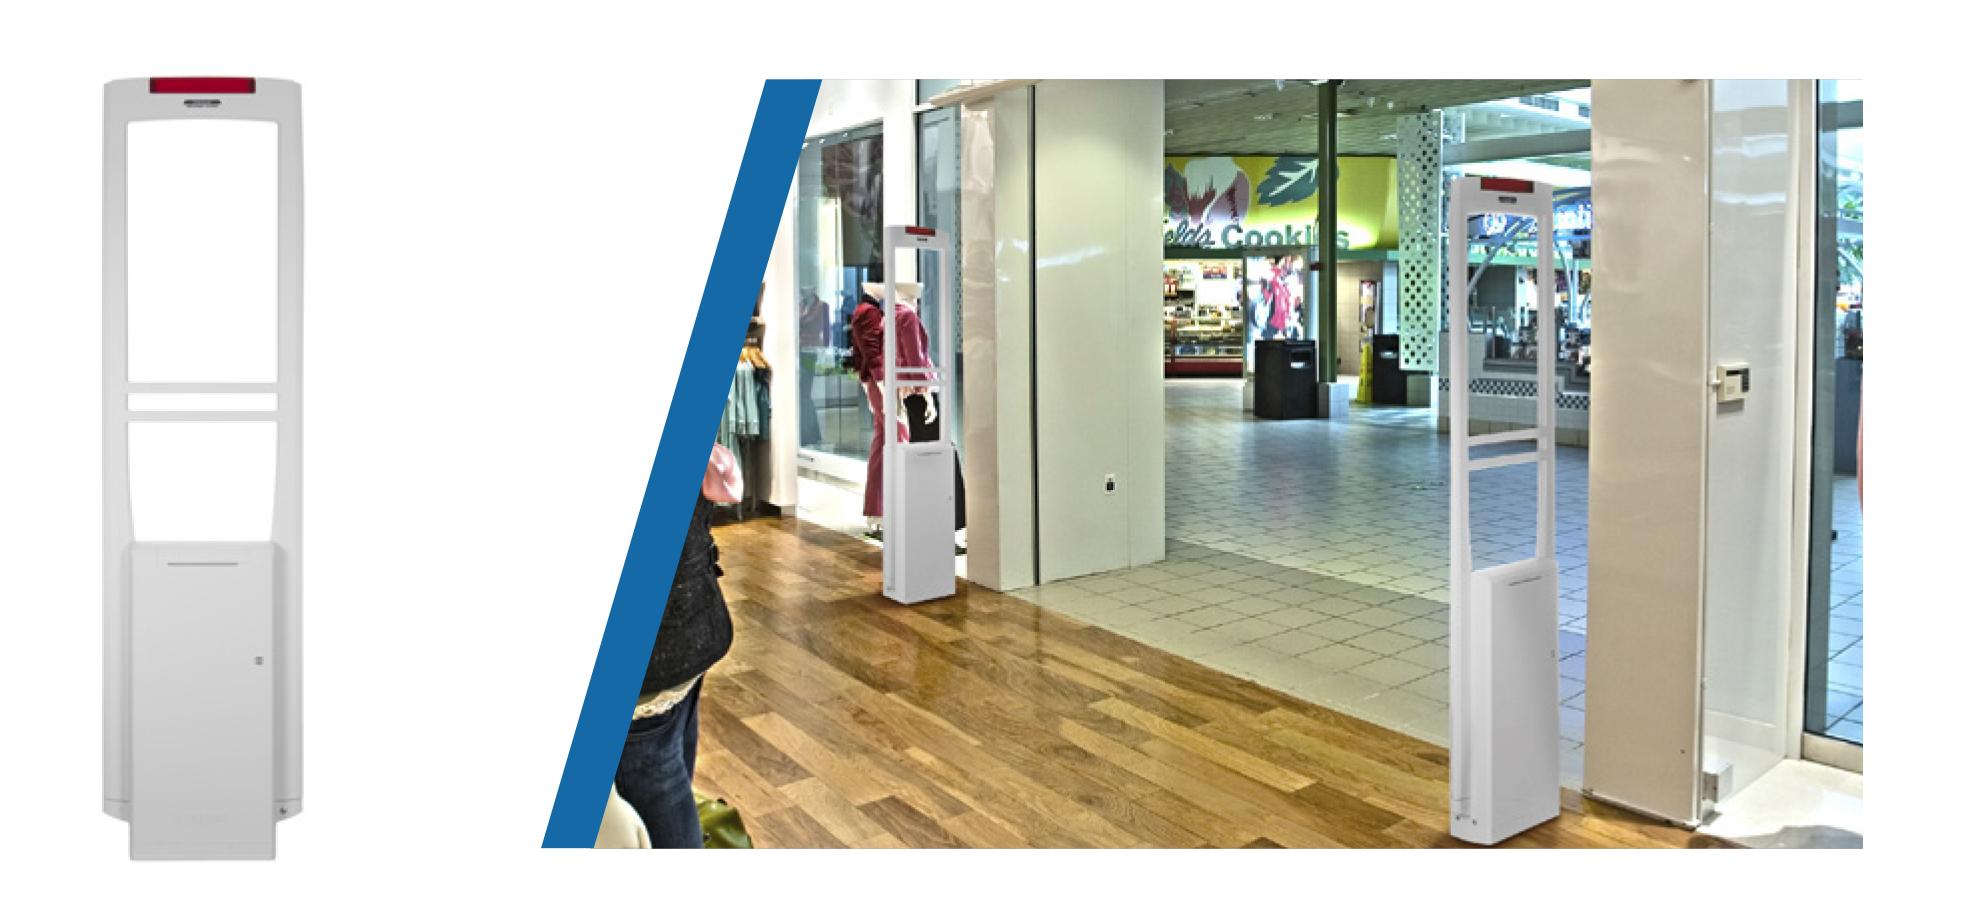 Anti-Shoplifting Systems Suplliers in UAE